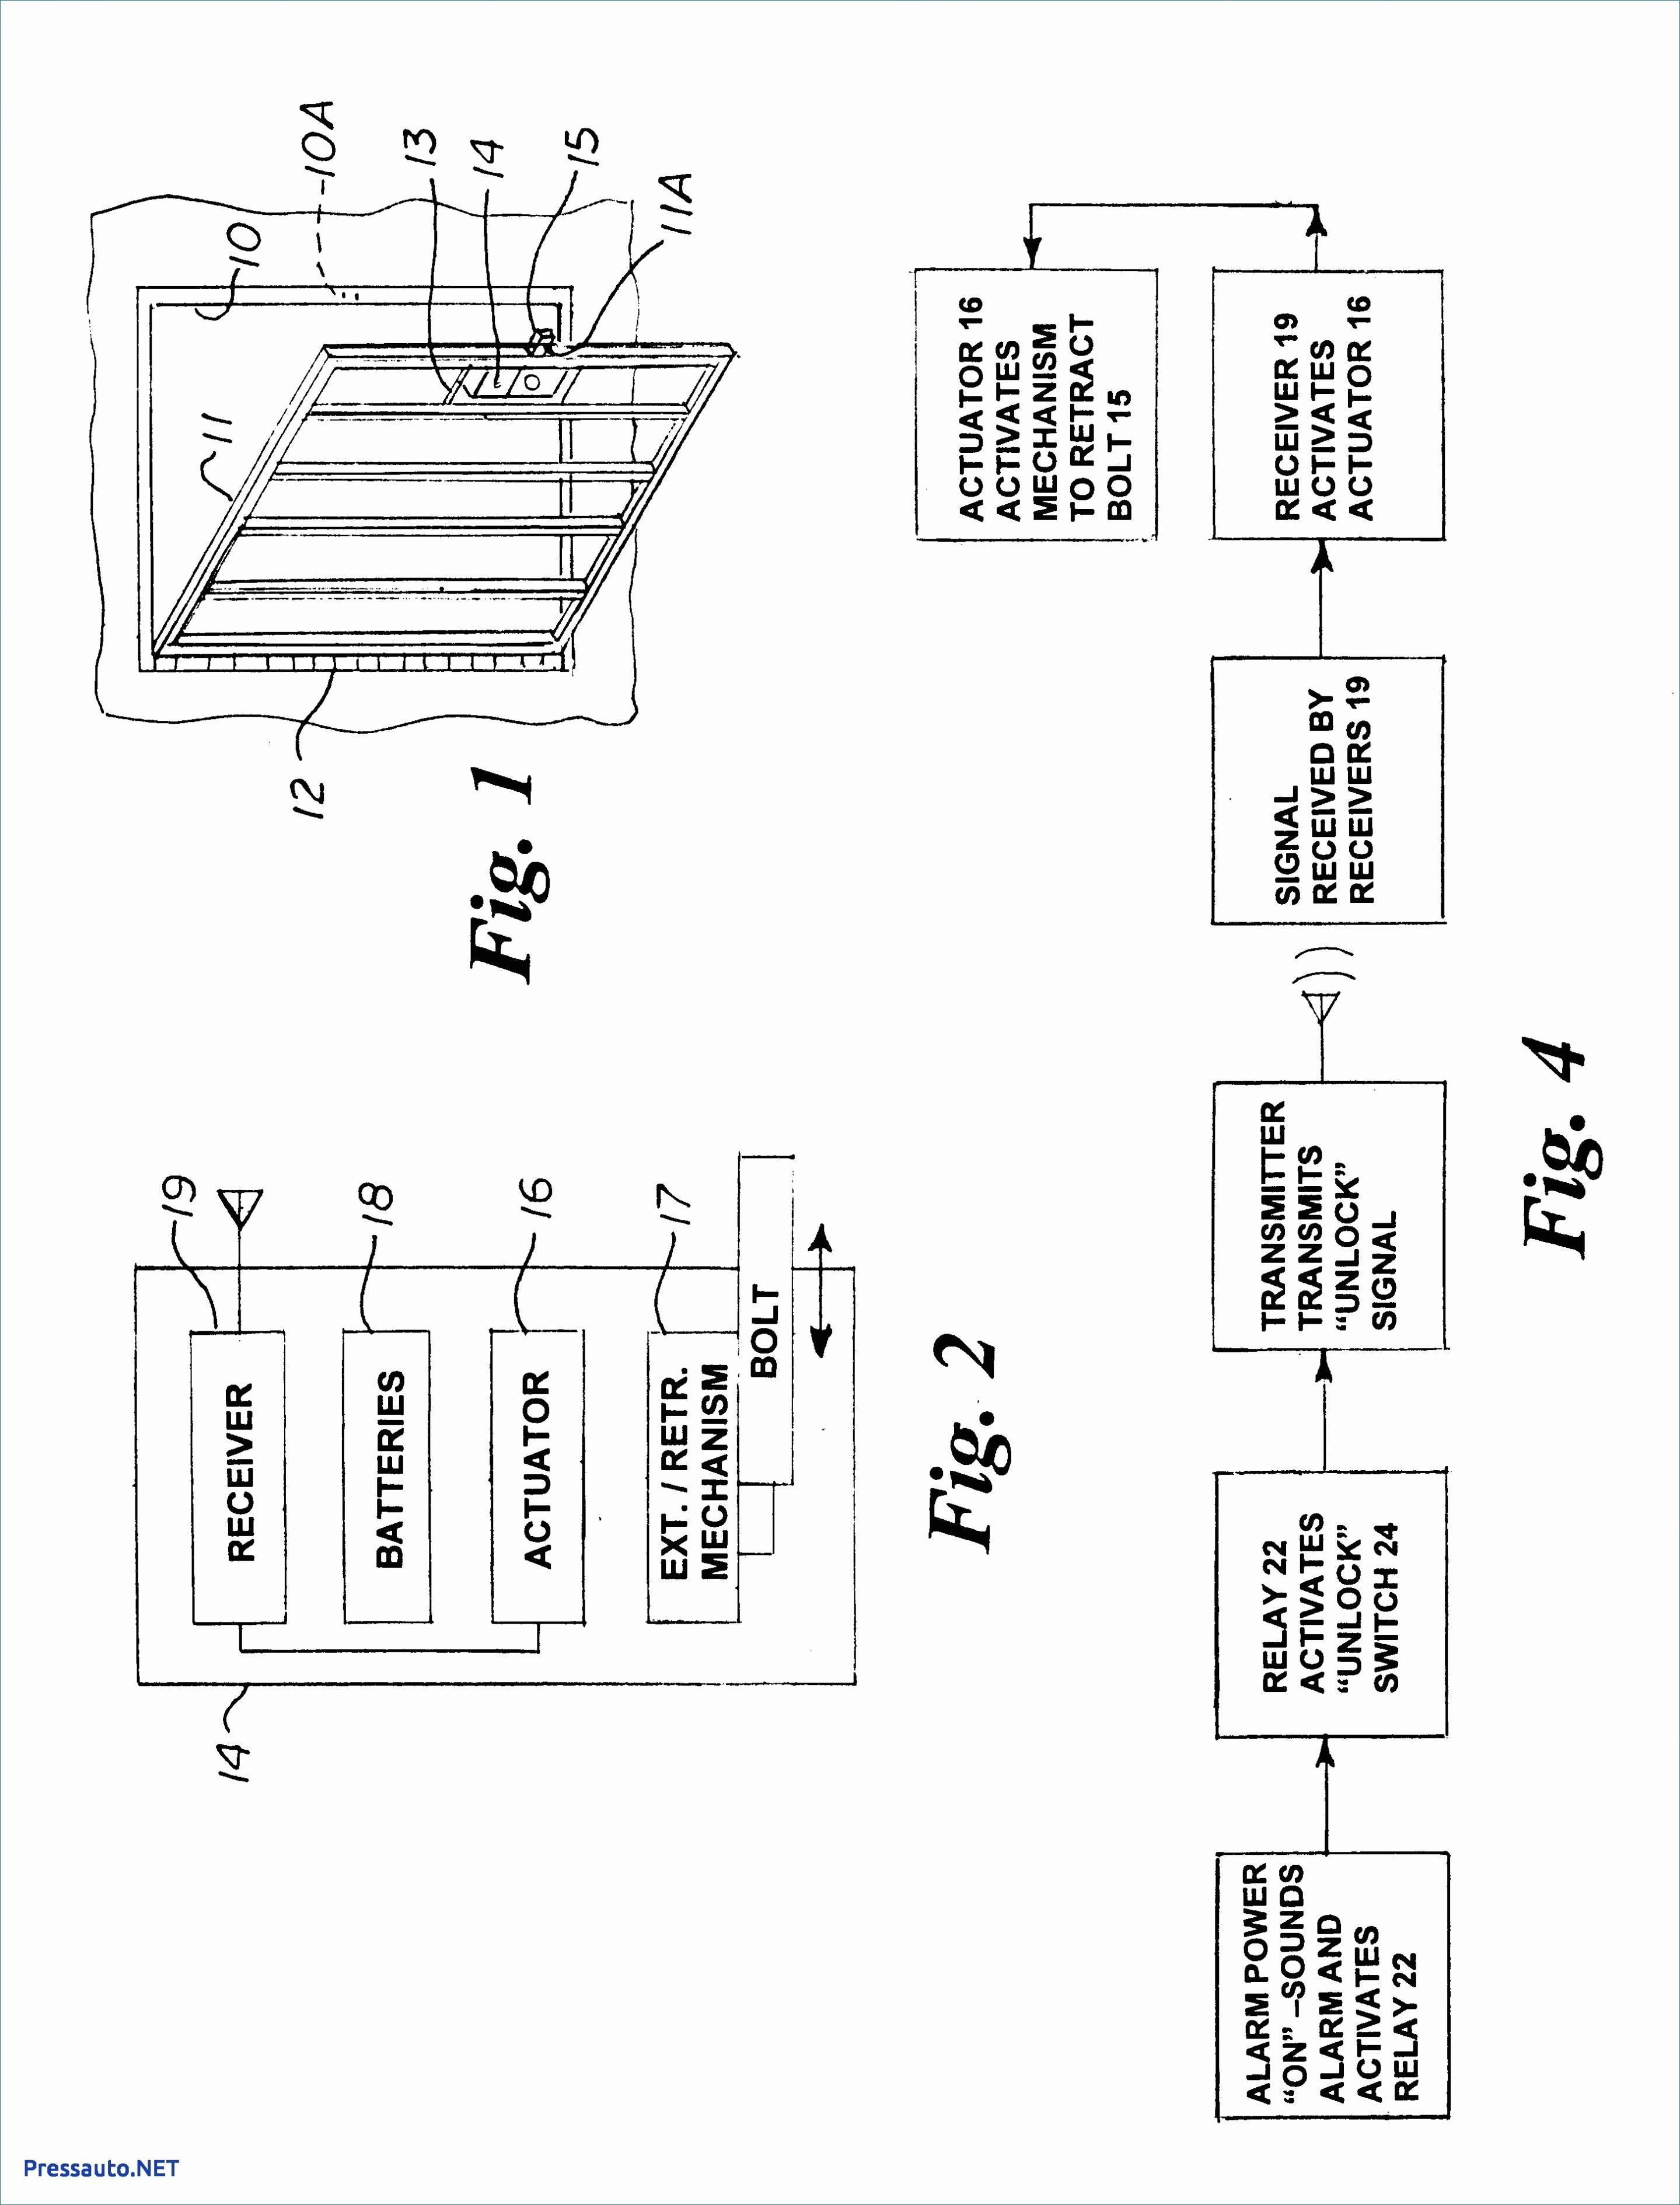 Yamaha Outboard Fuel Gauge Wiring Diagram | Wiring Diagram - Yamaha Outboard Gauges Wiring Diagram